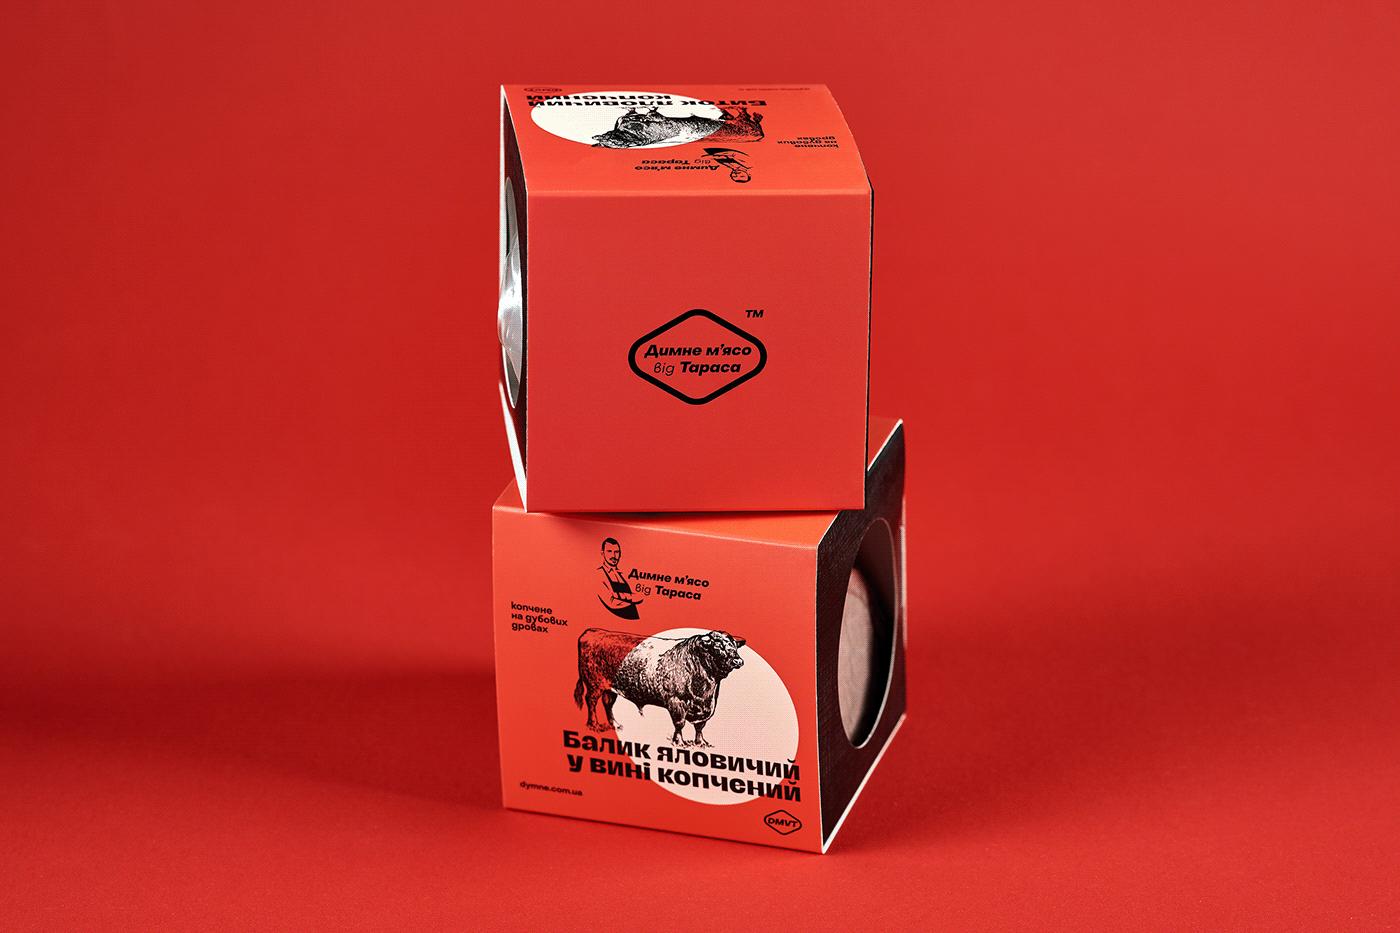 Image may contain: animal and box